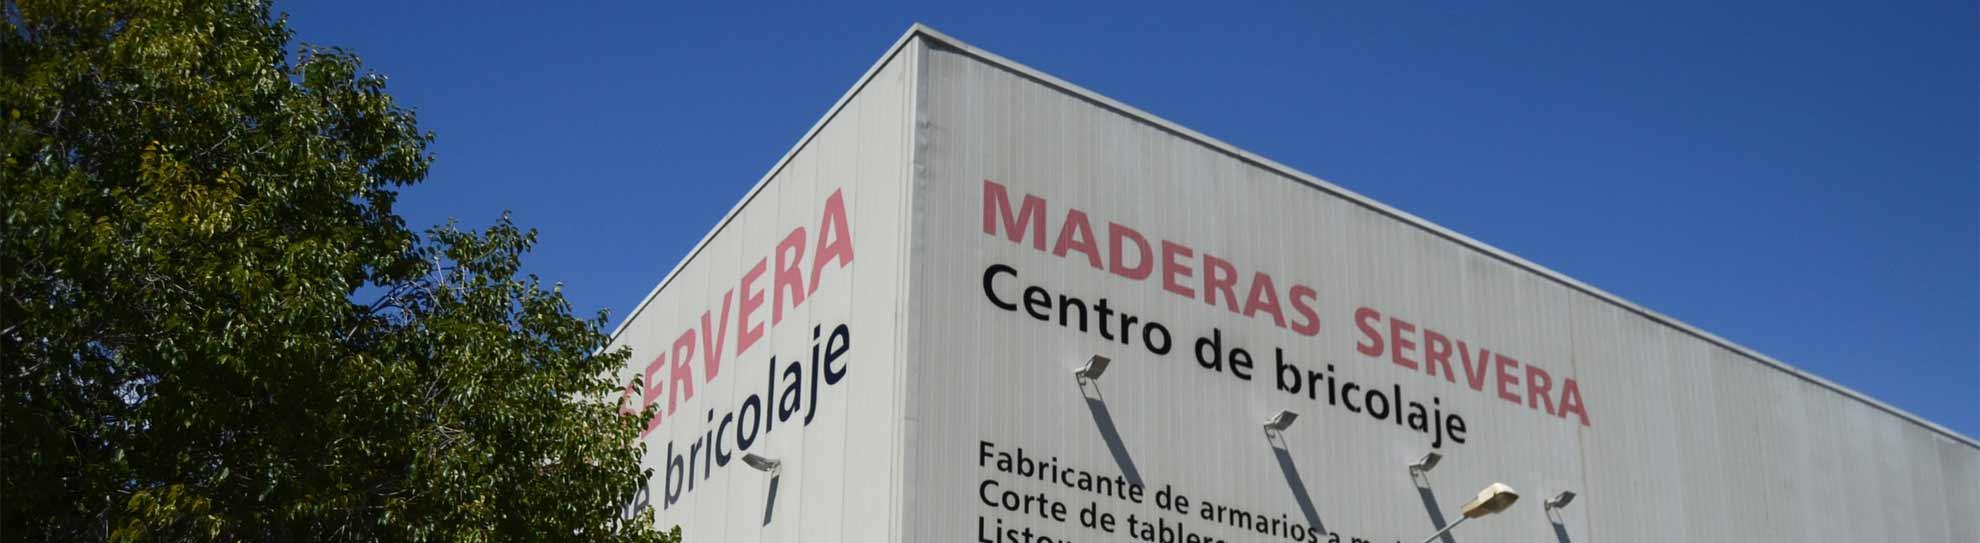 Area Profesional Maderas Servera Armarios Puertas Carpinteria